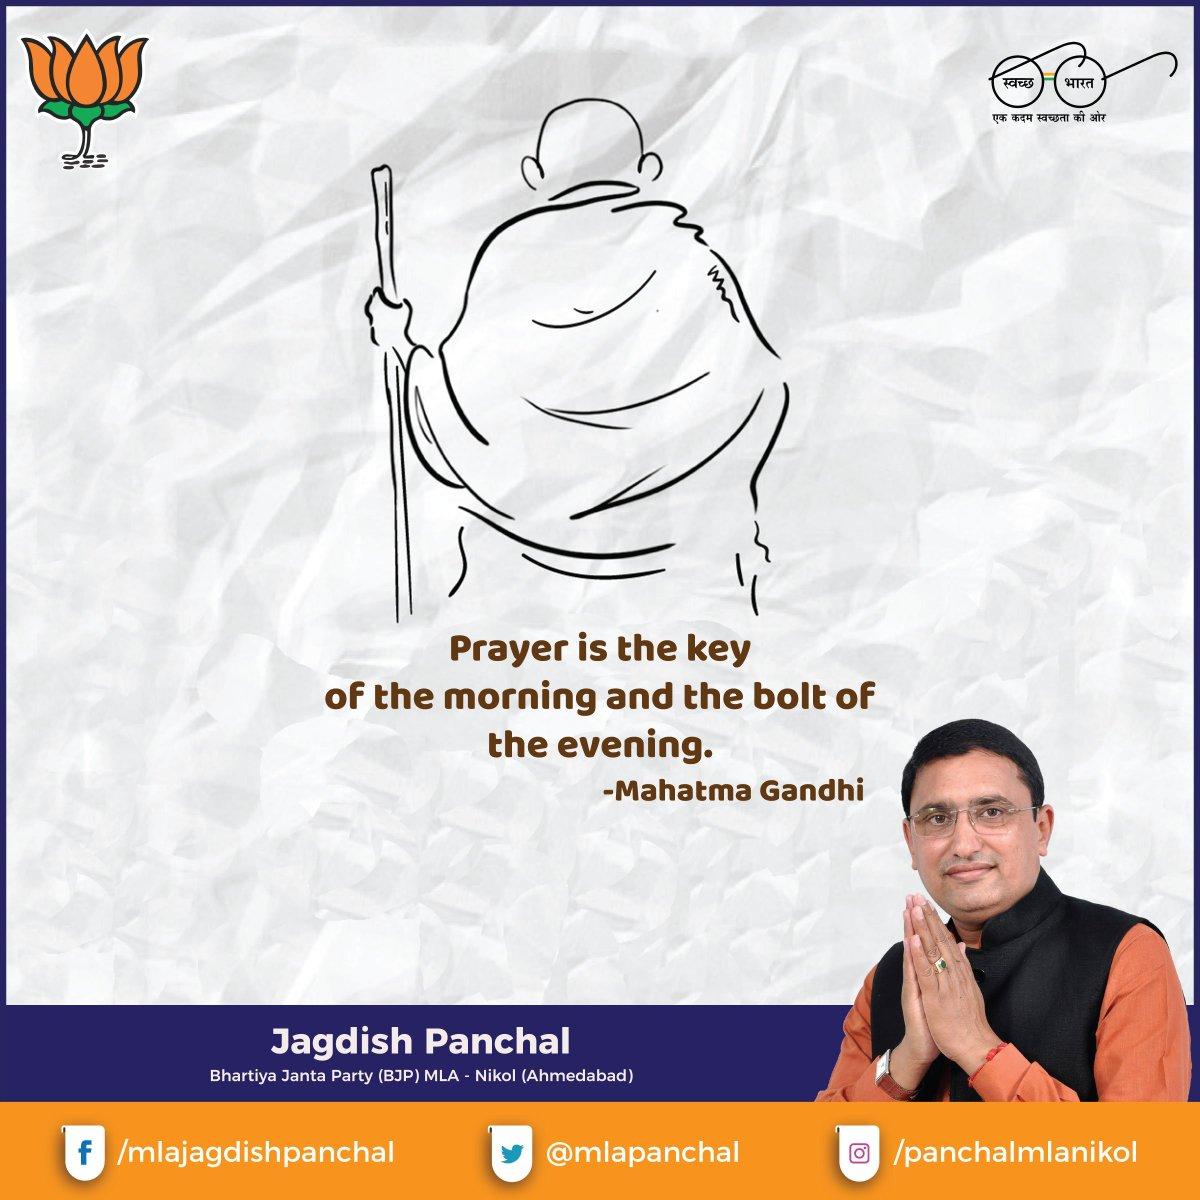 Prayer is the key of the morning and the bolt of the evening. - Mahatma Gandhi #jagdish_panchal #bjp #mla #nikol #odhav #ahmedabad #gujarat<br>http://pic.twitter.com/qxjslt3XVt